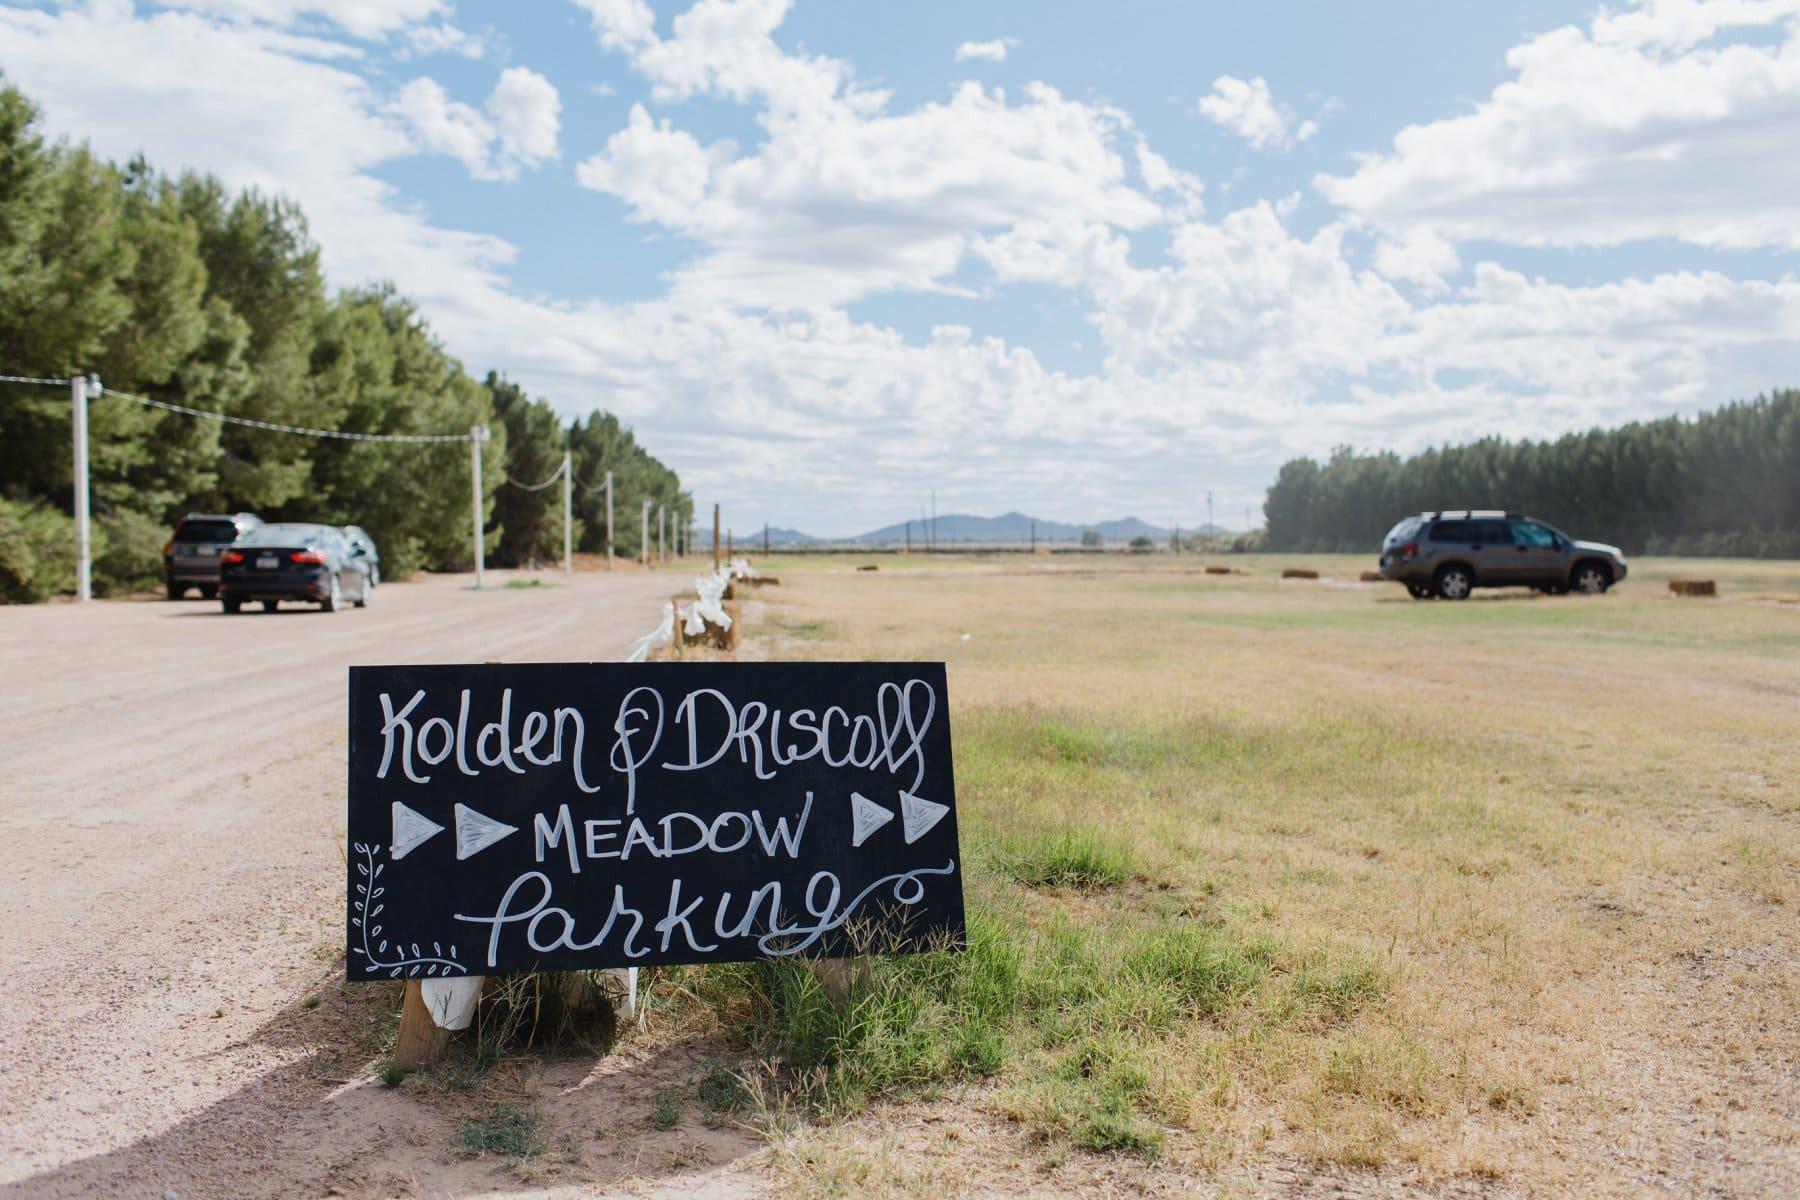 Schnepf Farms Meadow parking lot